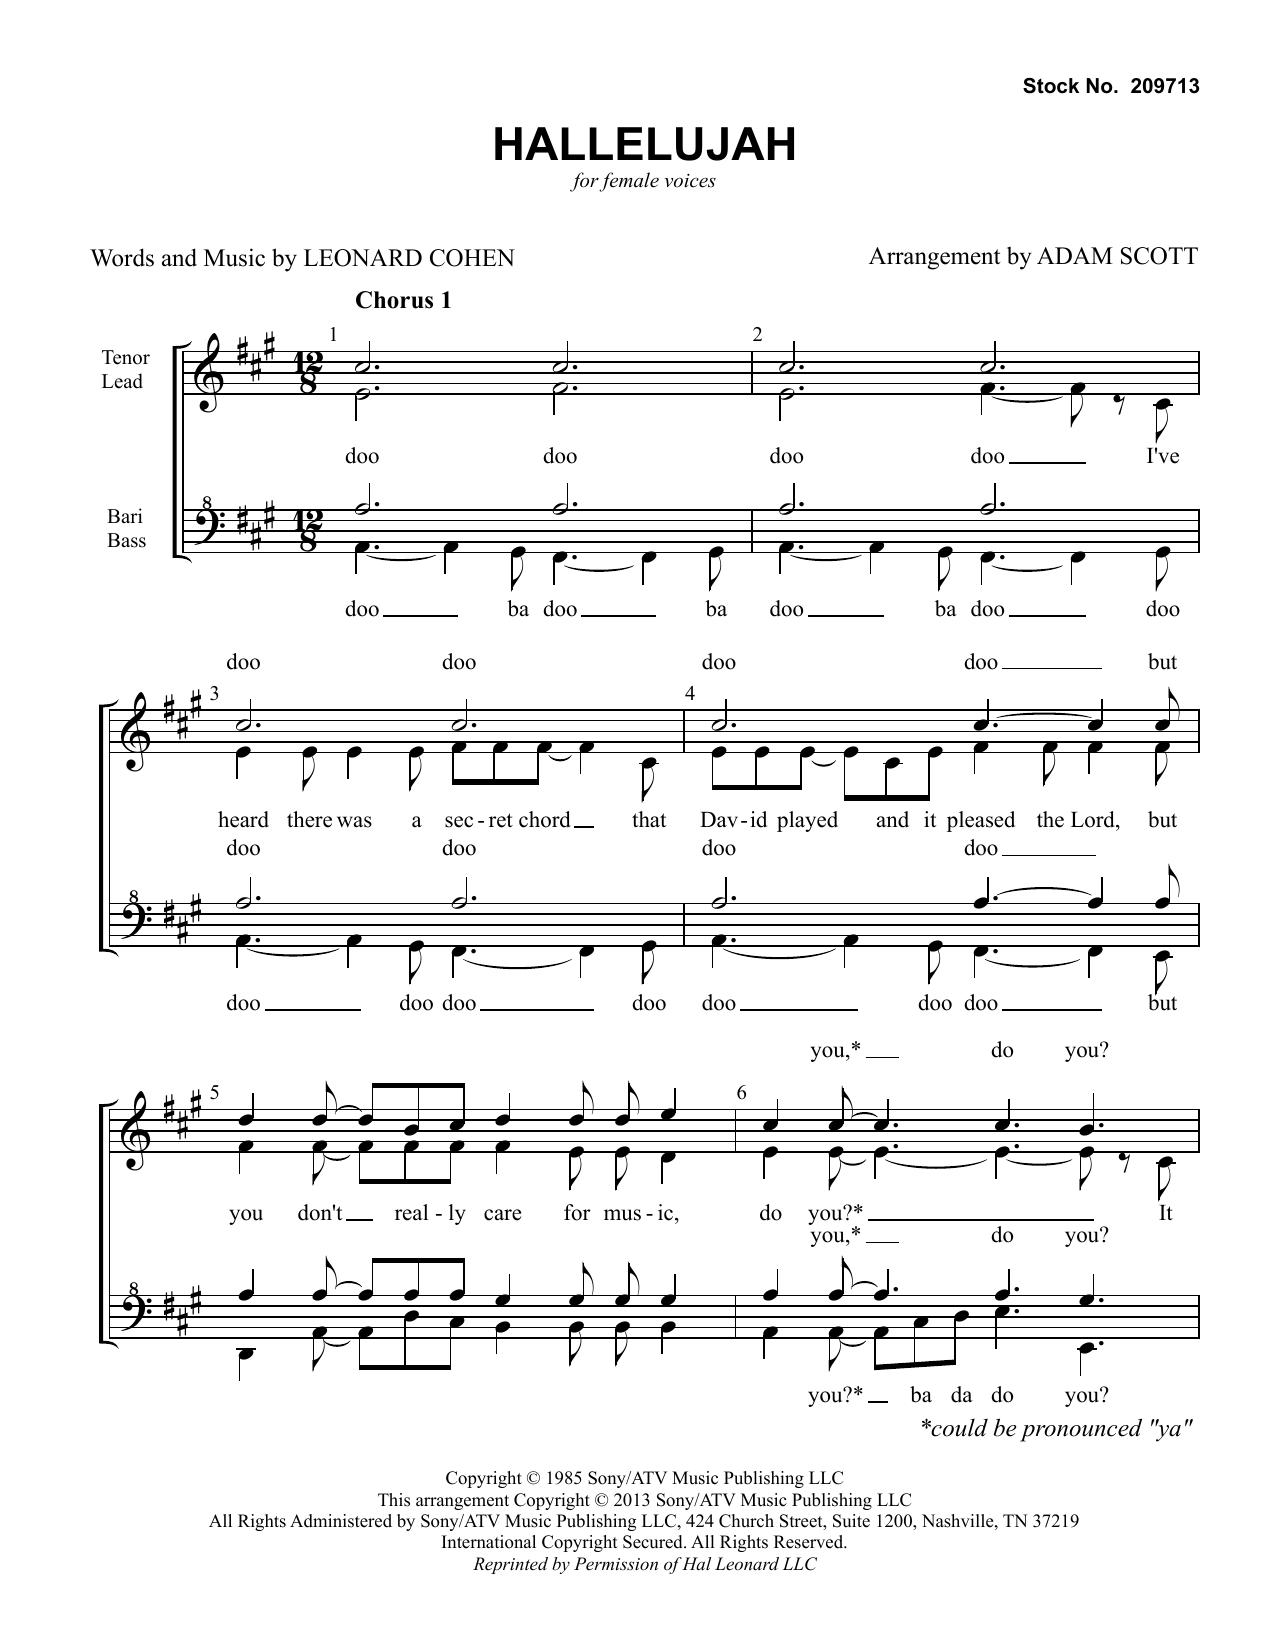 Hallelujah (arr. Adam Scott) Partition Digitale